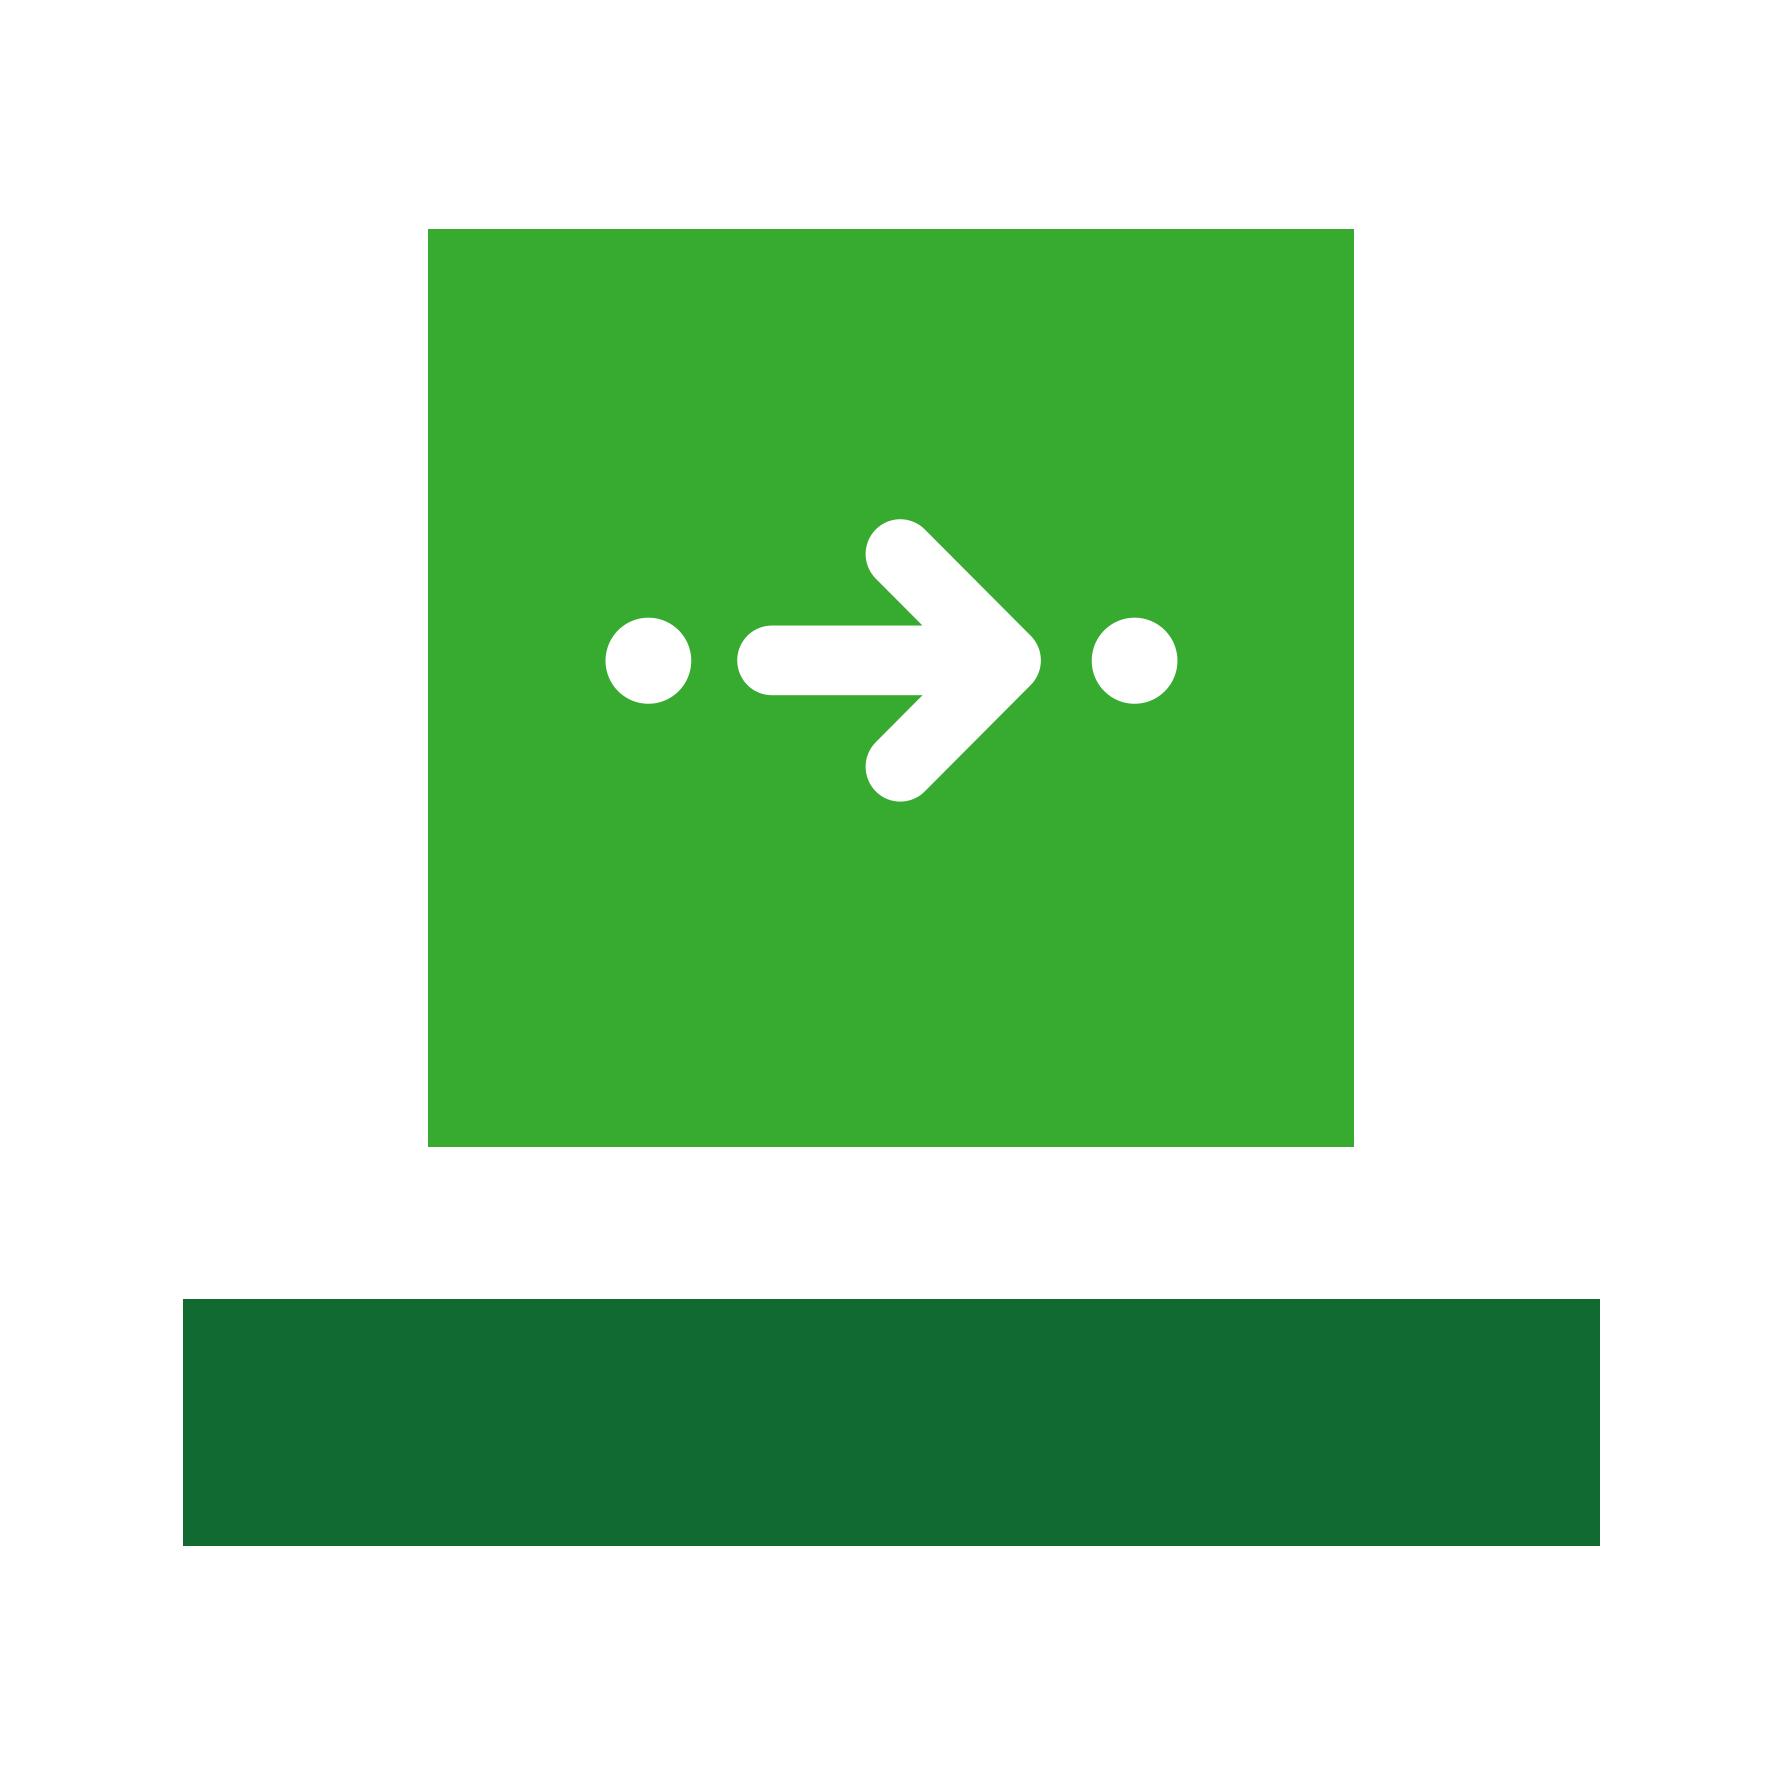 The Citymapper app logo